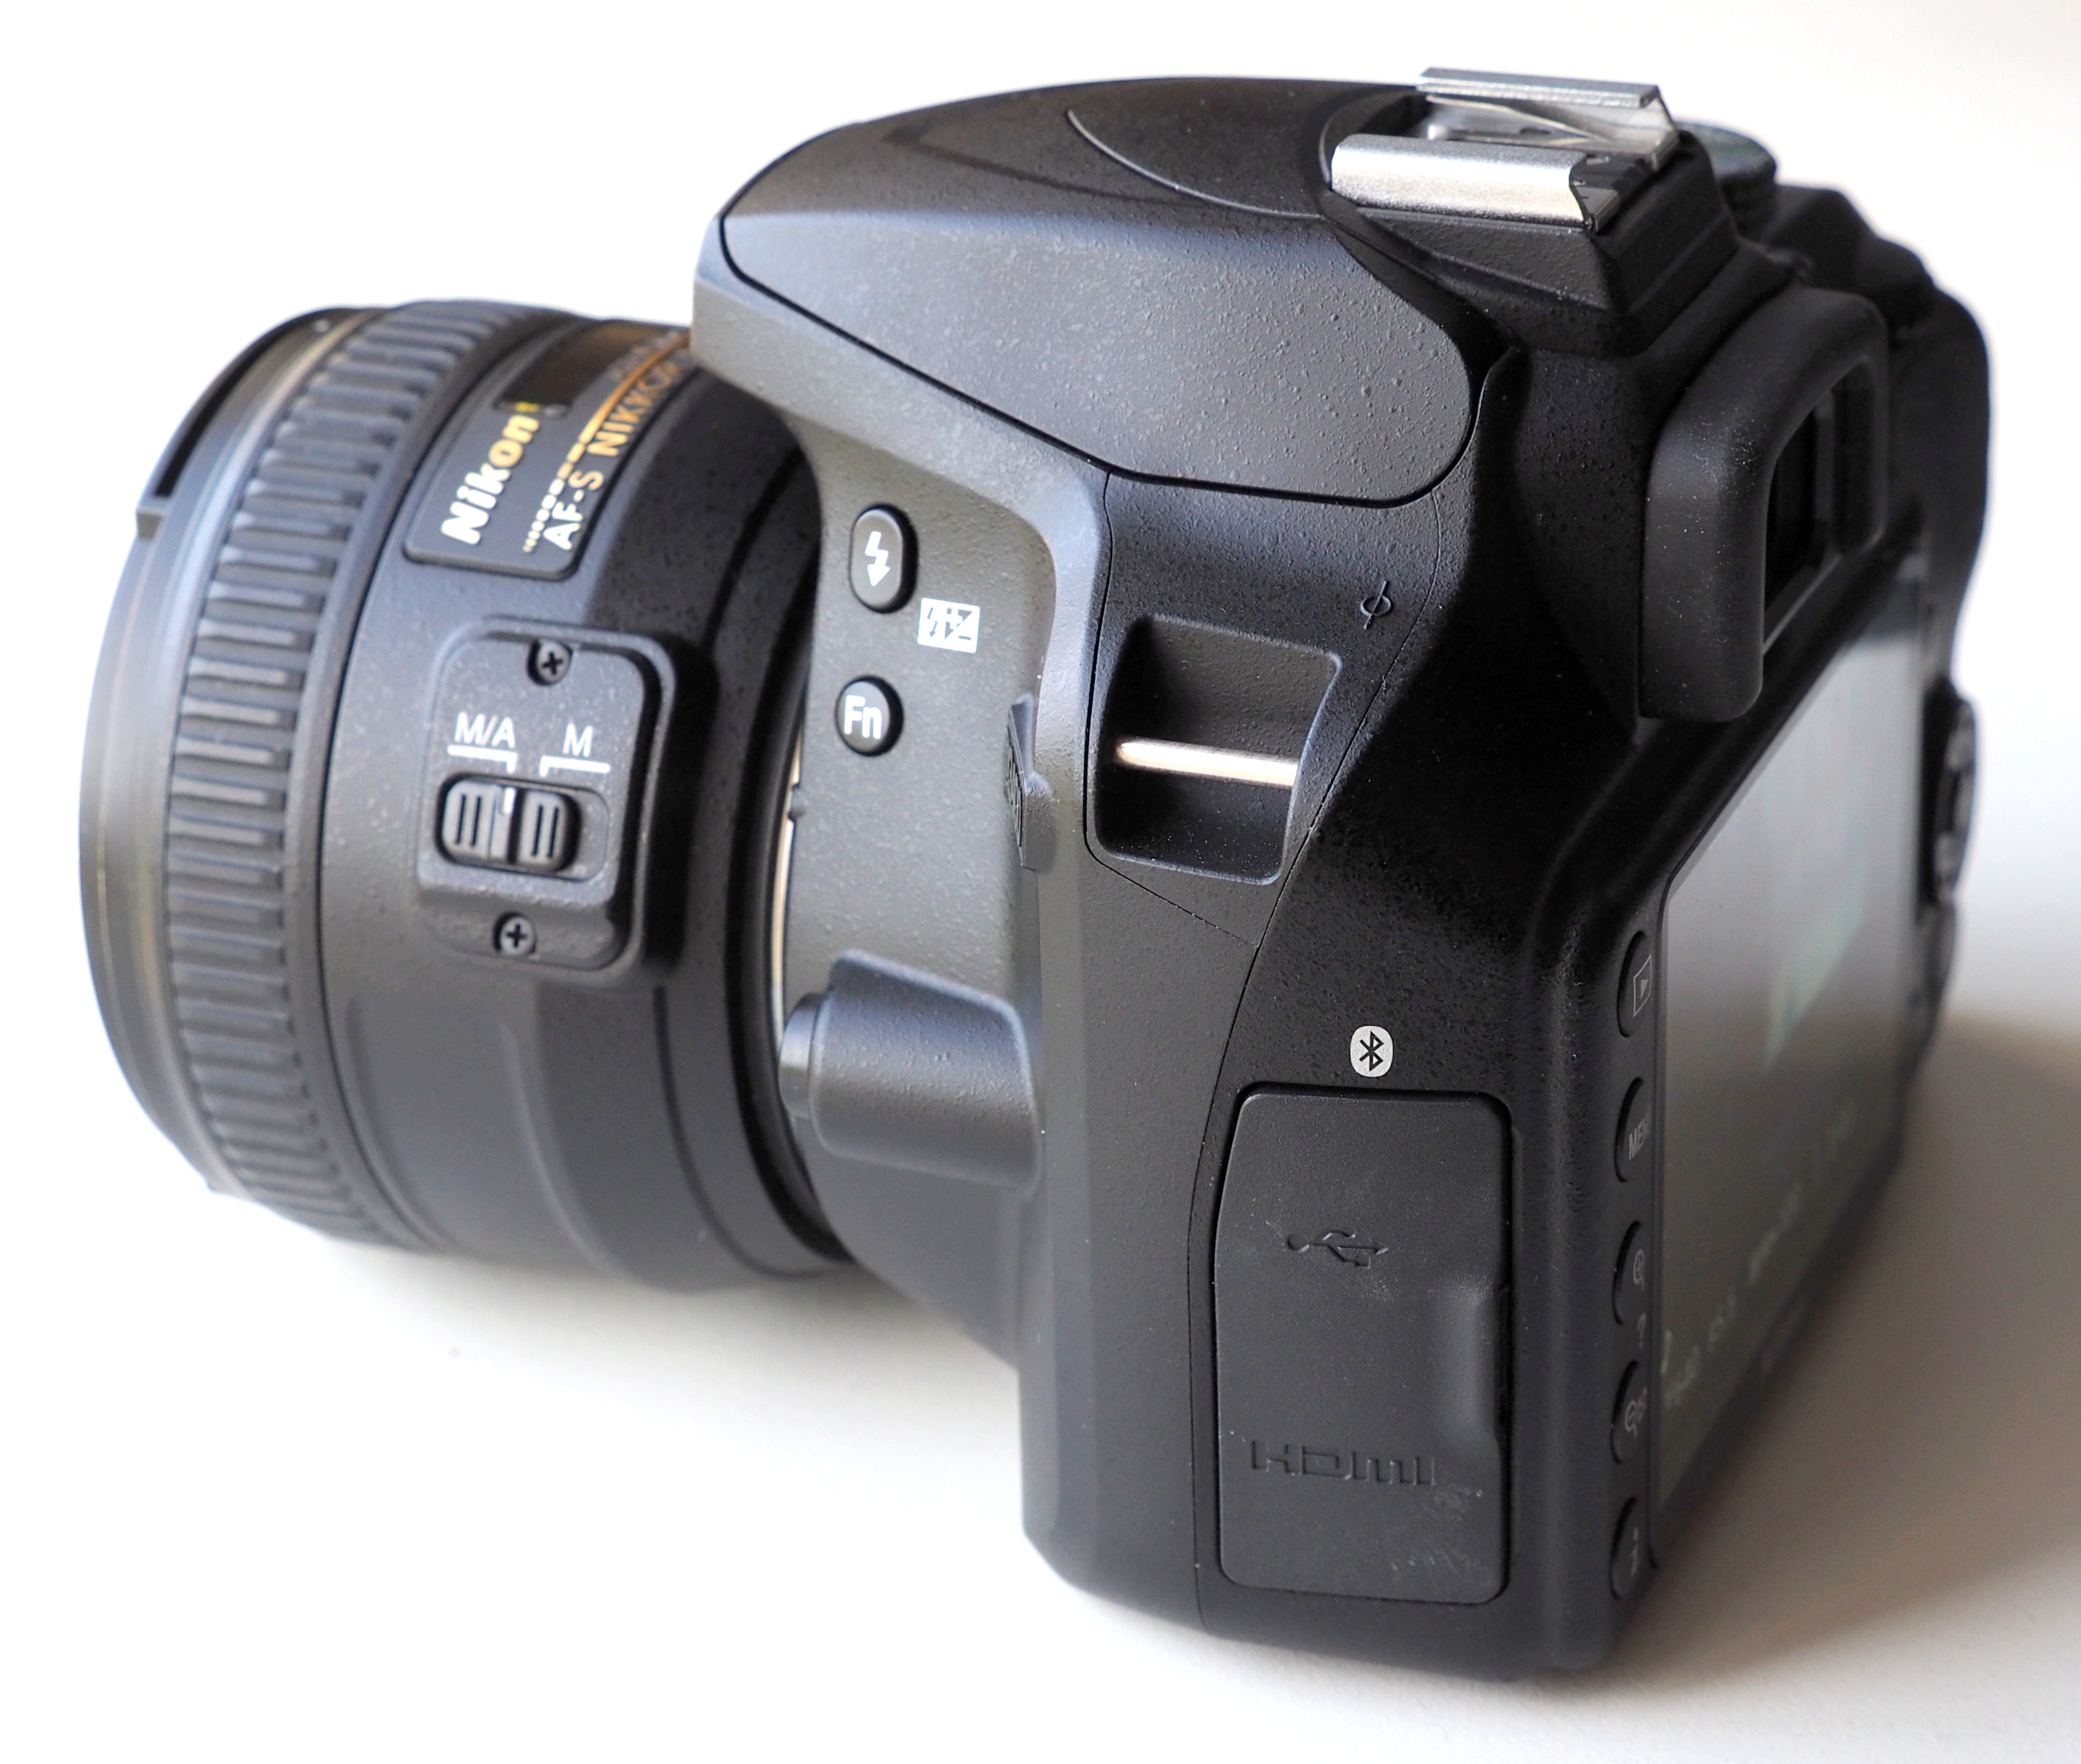 Mind Res Nikon D3400 Dslr 4 1476093754 Nikon D3400 Lenses Amazon Nikon D3400 Lenses Compatibility dpreview Nikon D3400 Lenses